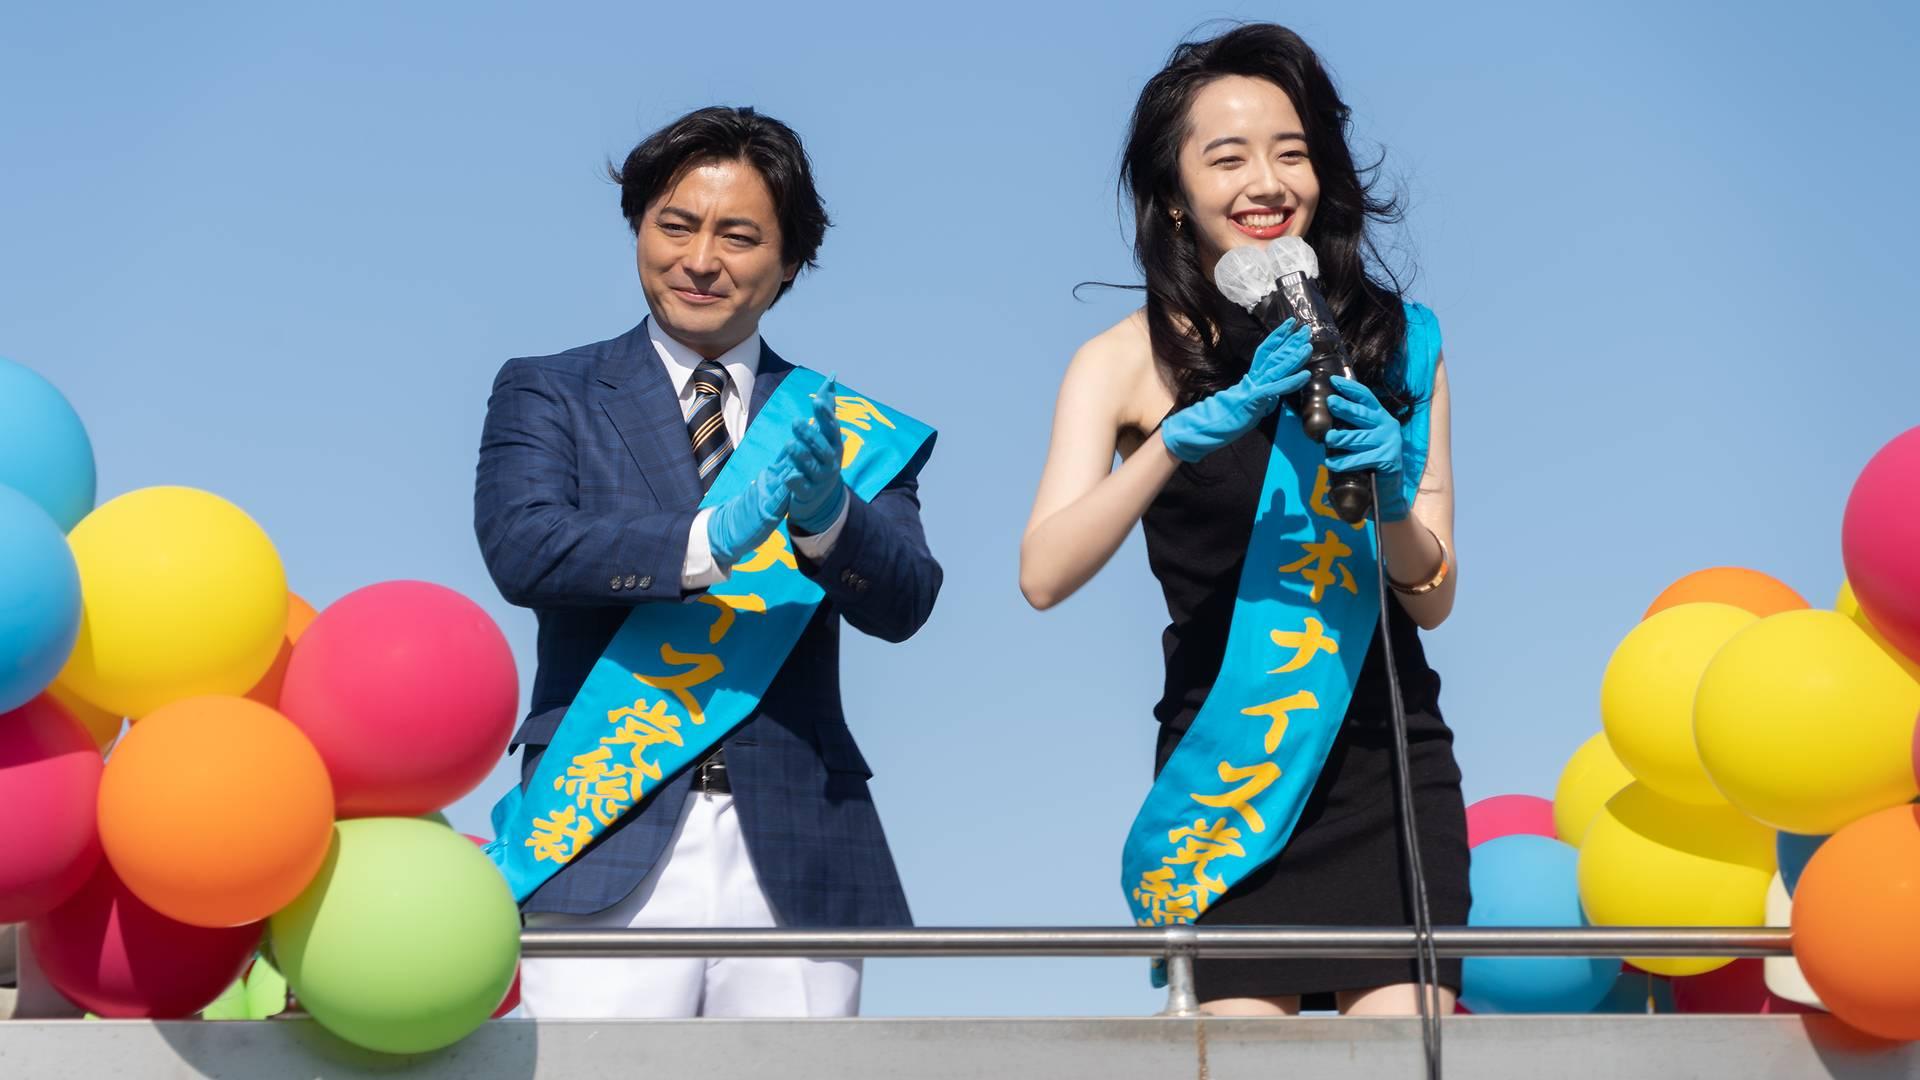 Đạo diễn Toru Muranishi (Takayuki Yamada thủ vai) và nữ diễn viên Kaoru Kuroki (Misato Morita thủ vai).